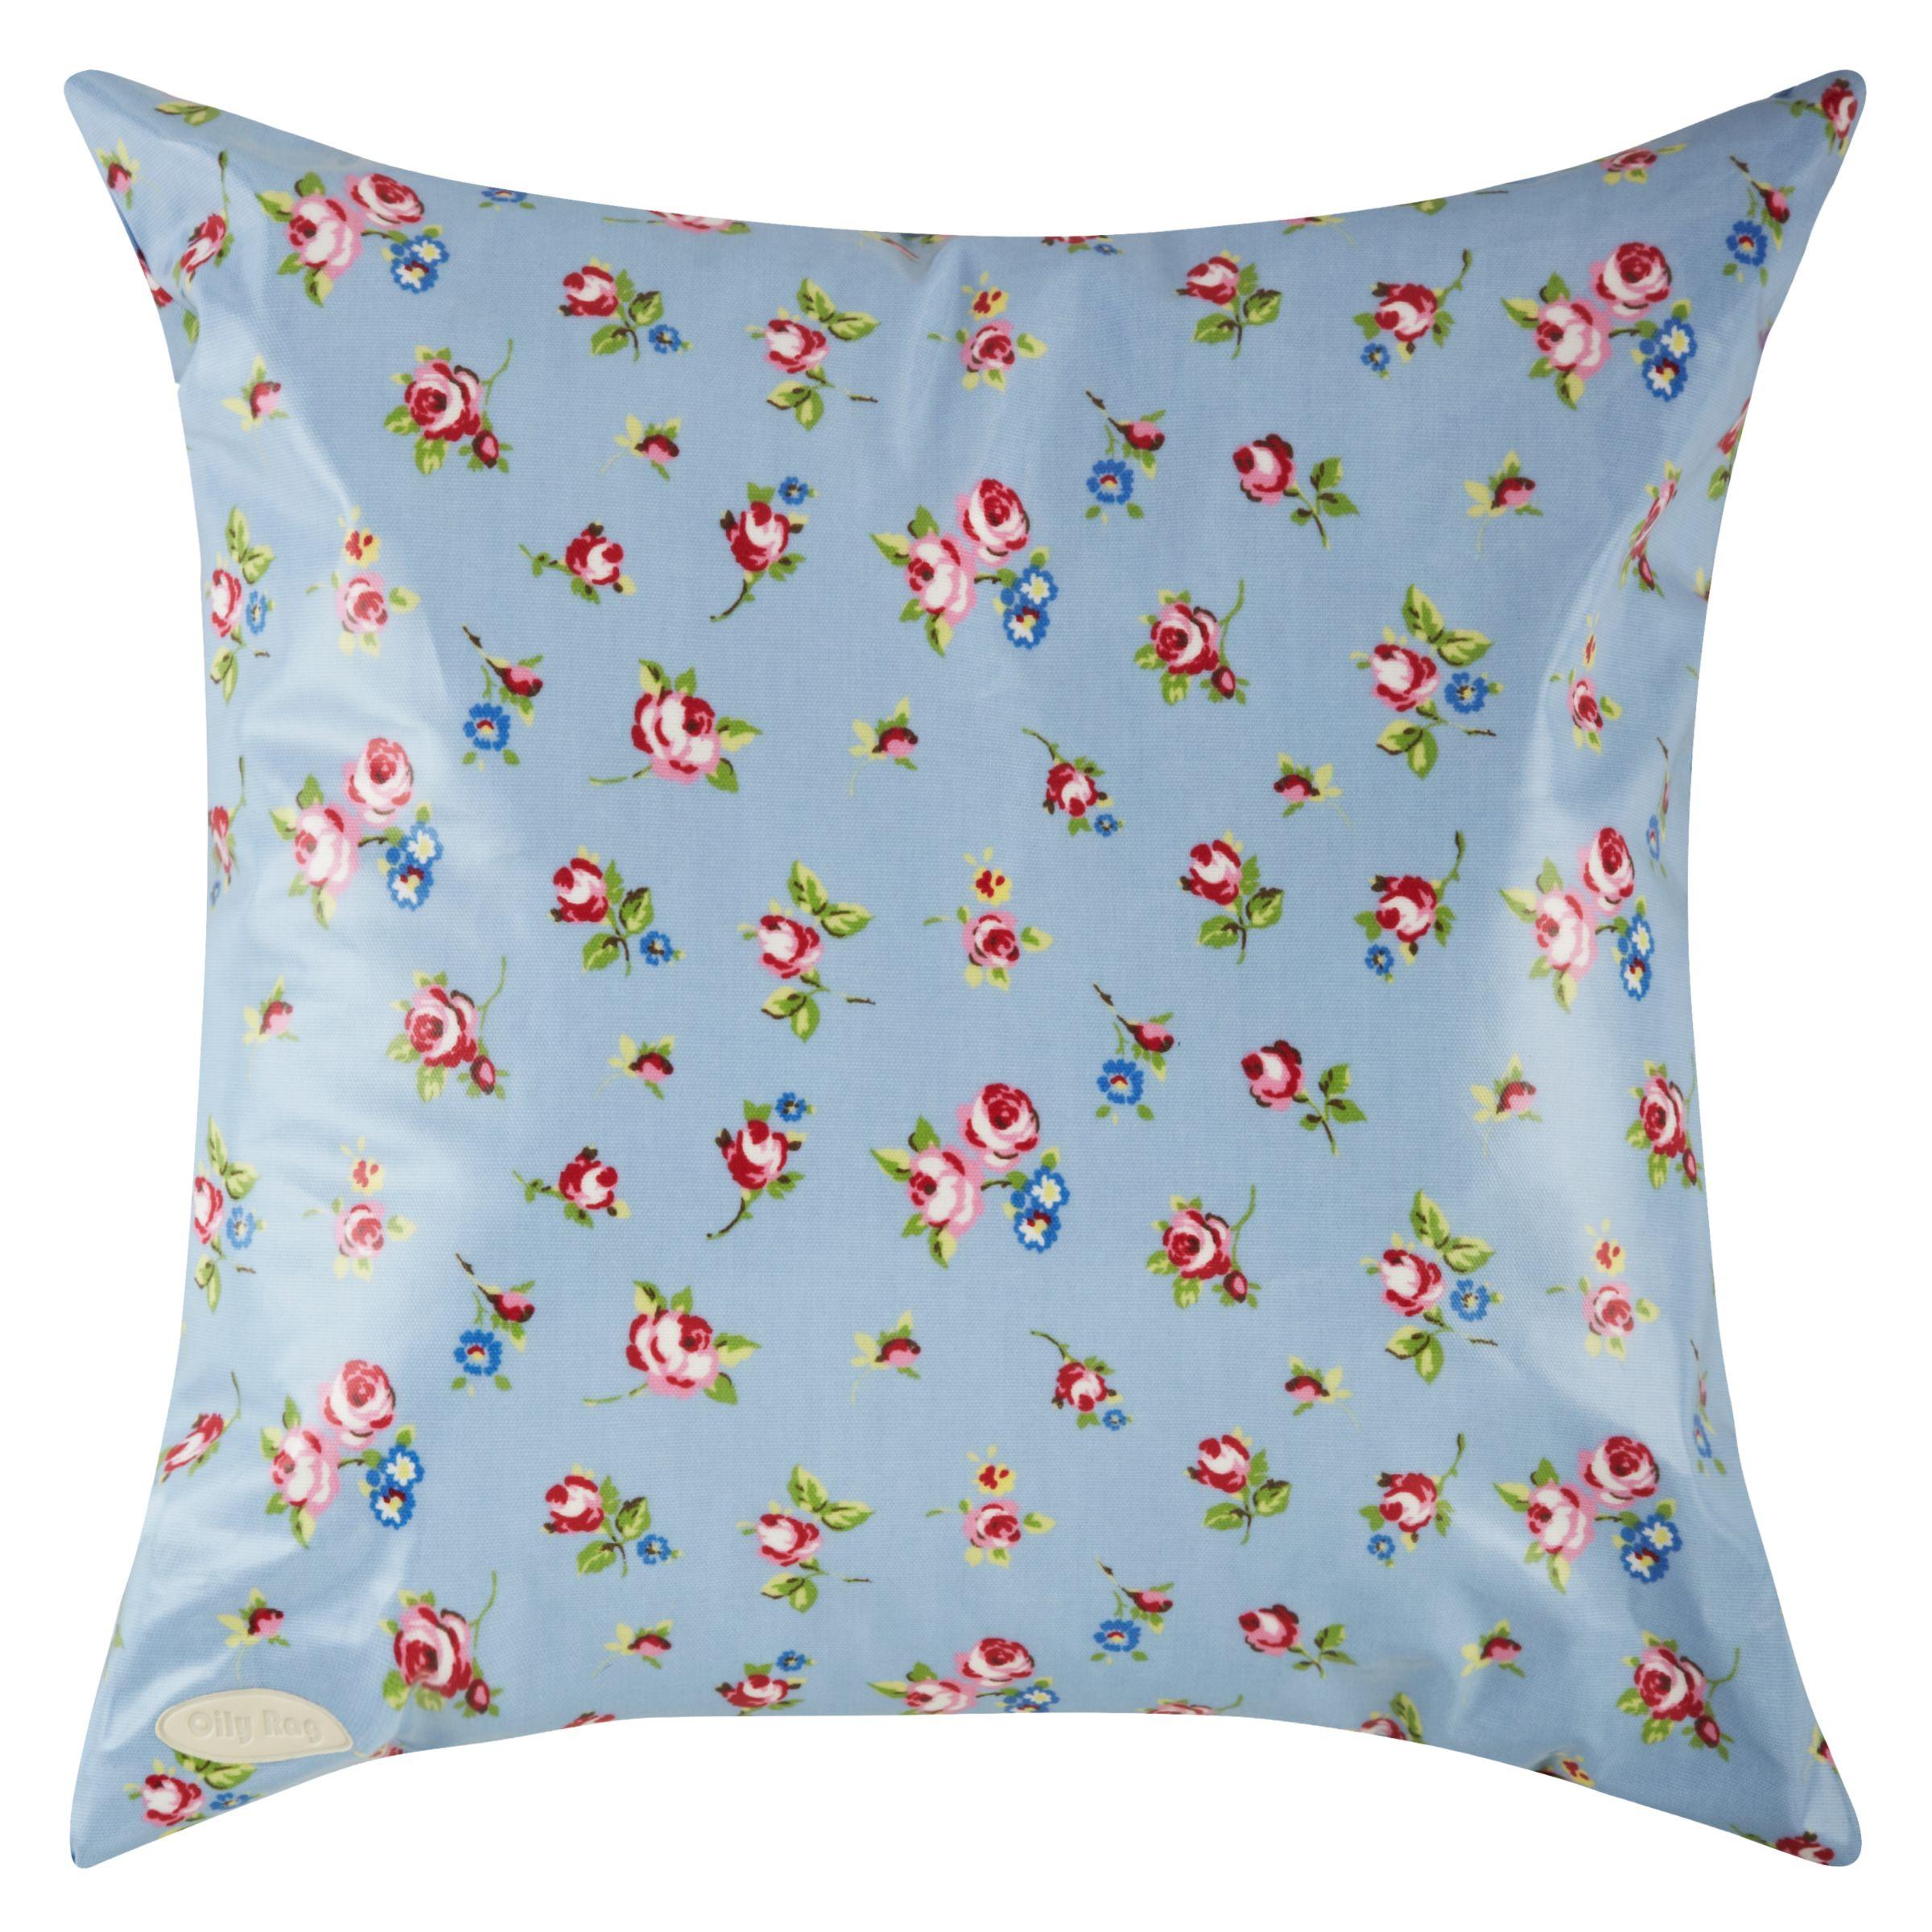 Oily Rag Rosebud Outdoor Cushion, 50 x 50cm